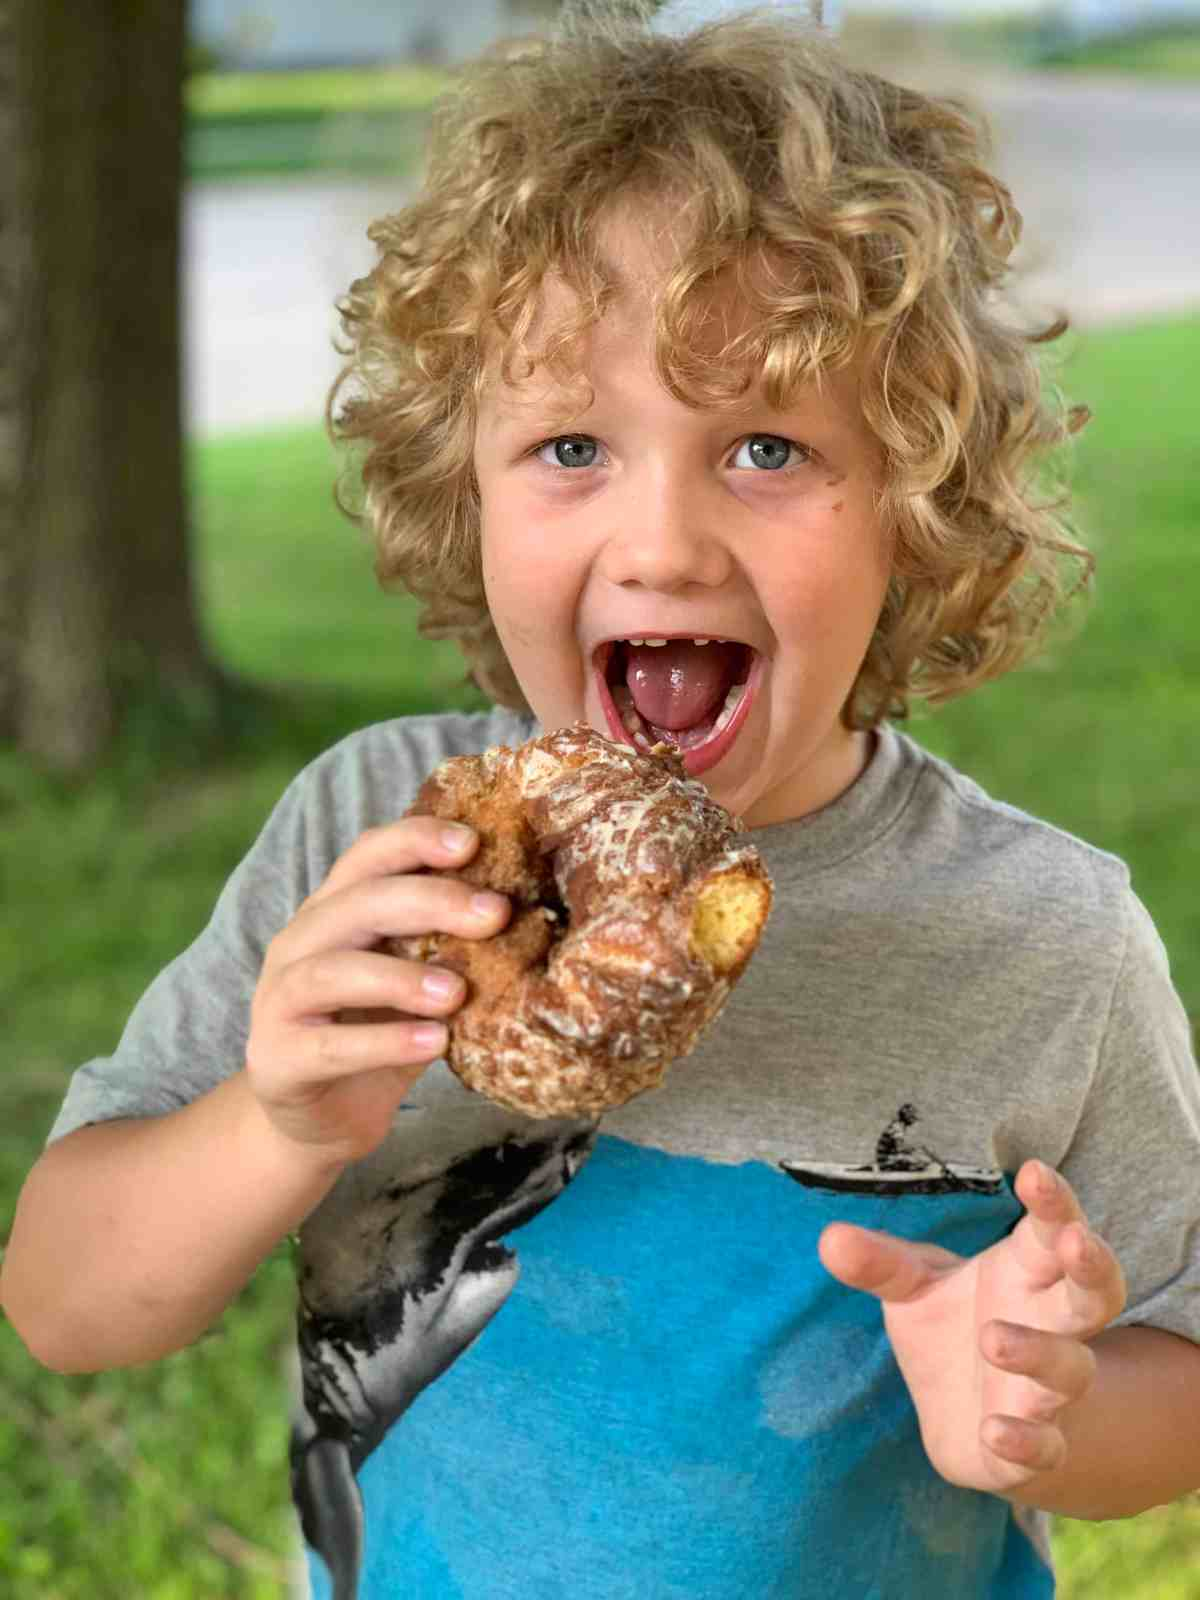 Butler County Donut Trail preschooler eating a donut